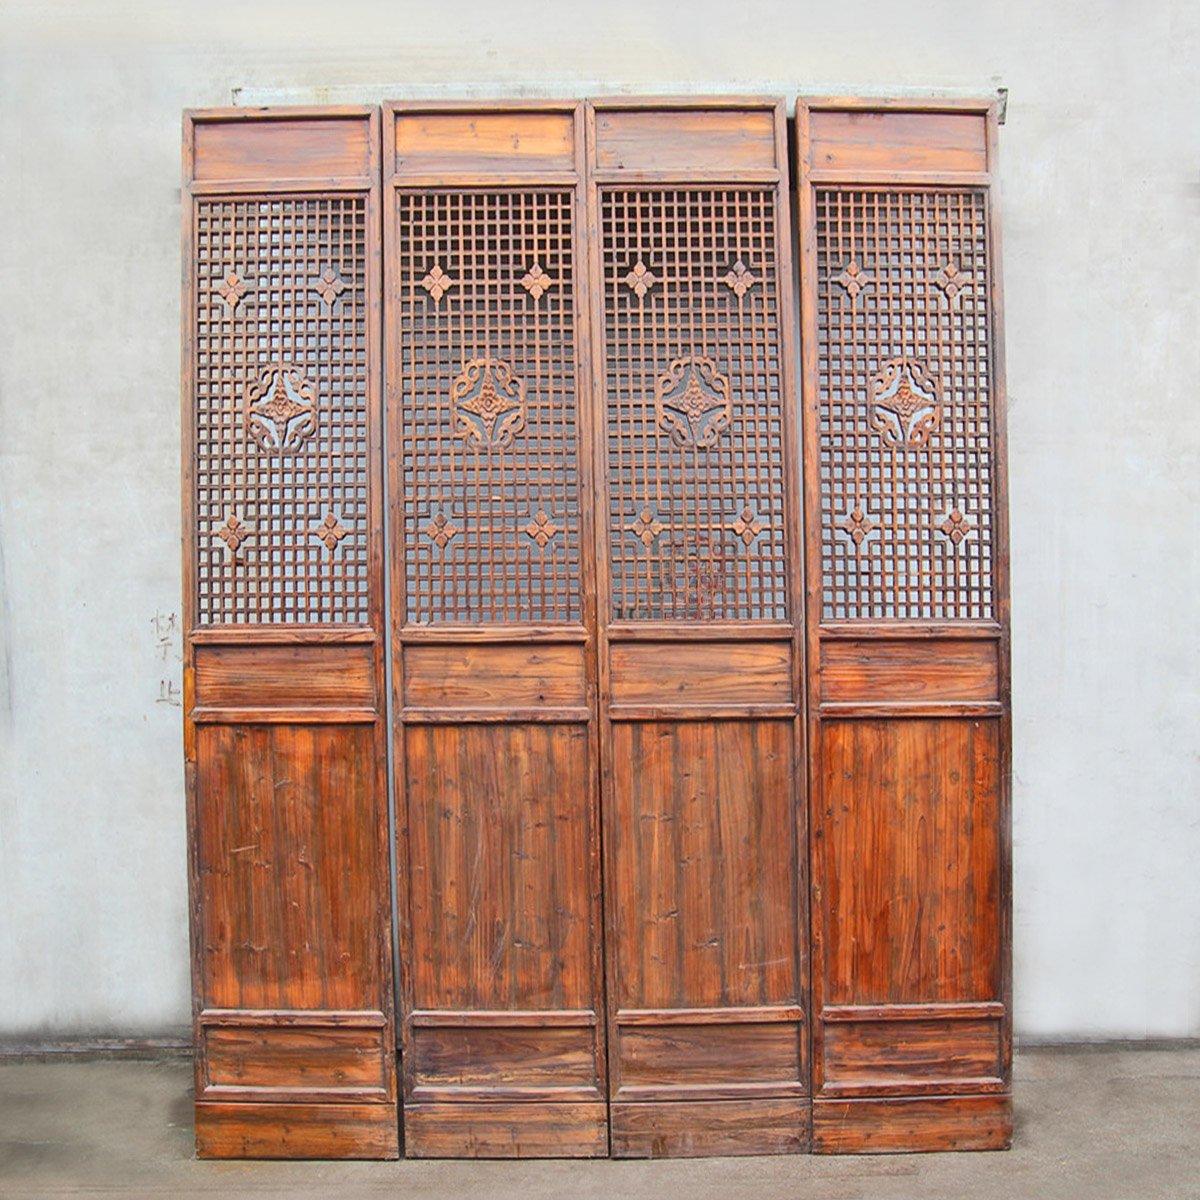 Carved Wood Lattice Screen